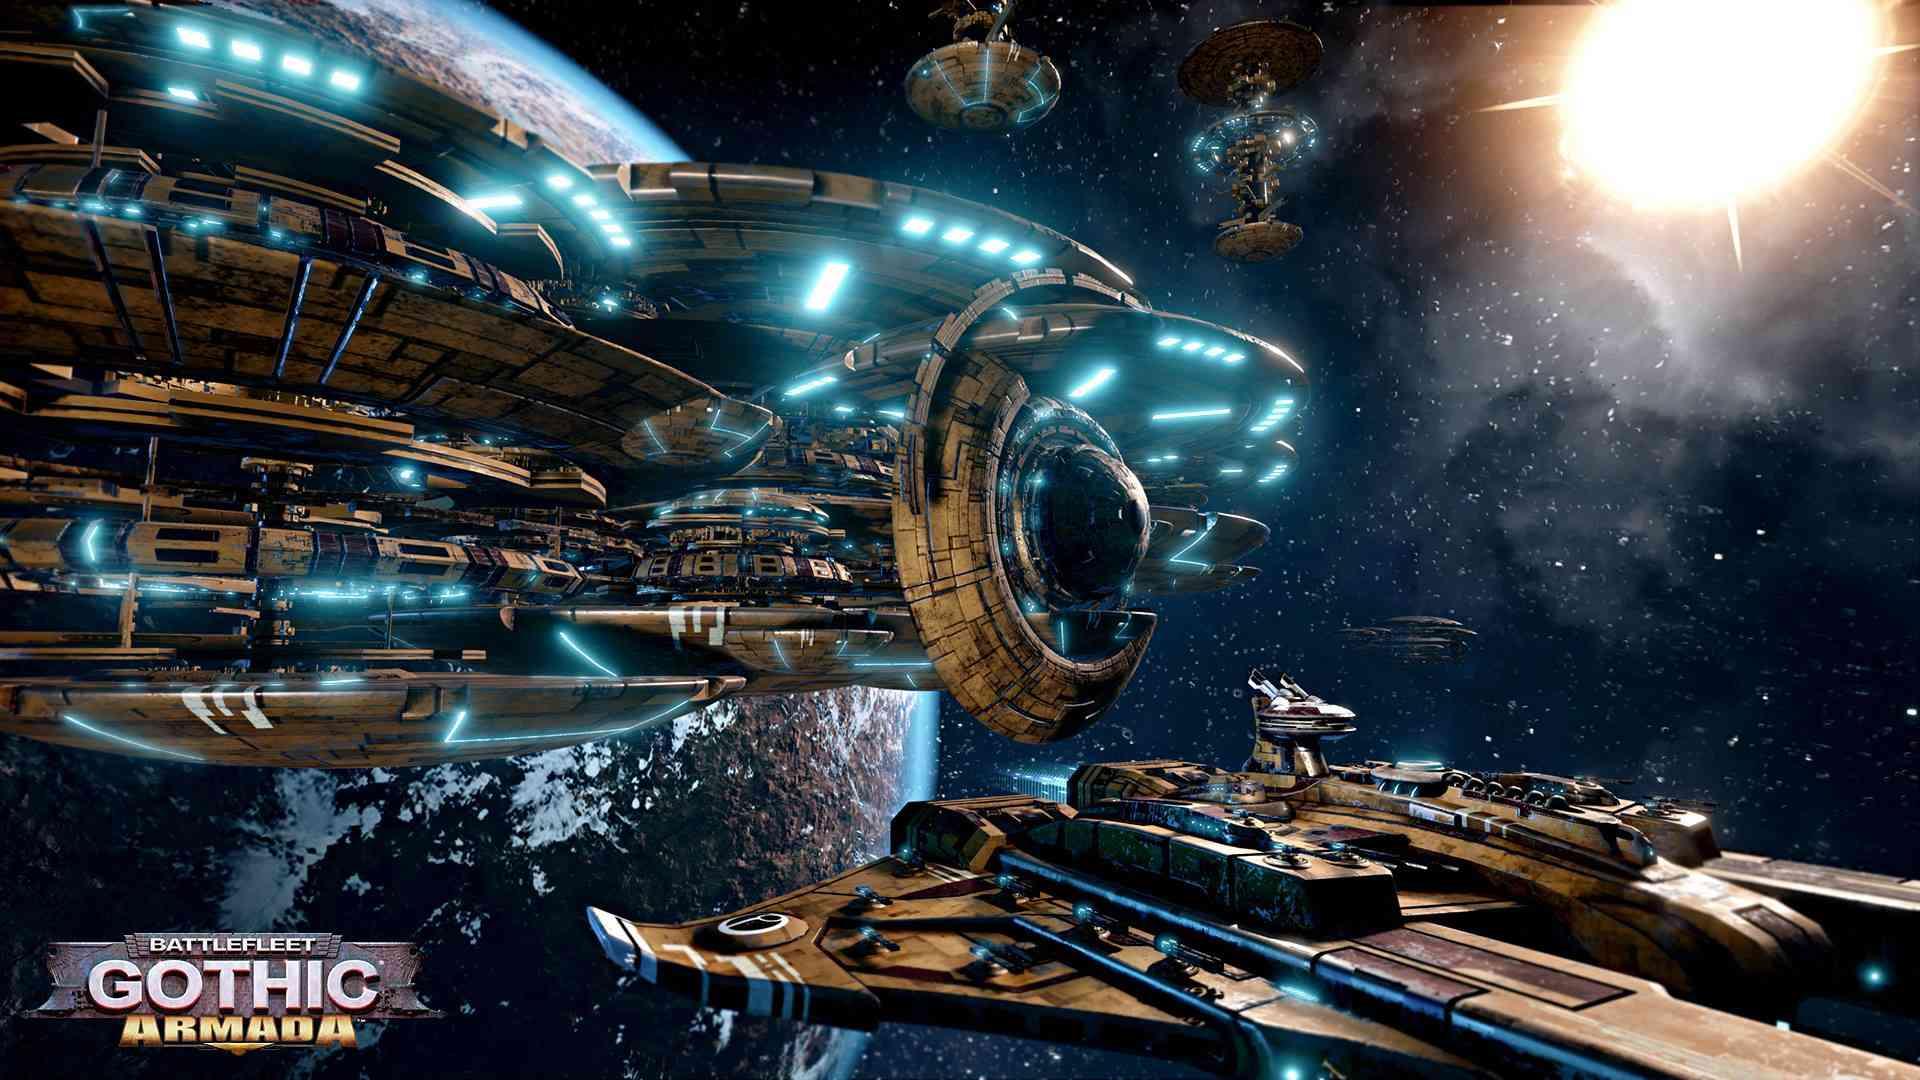 [Jeu vidéo] Battlefleet Gothic : Armada - Page 18 14231710